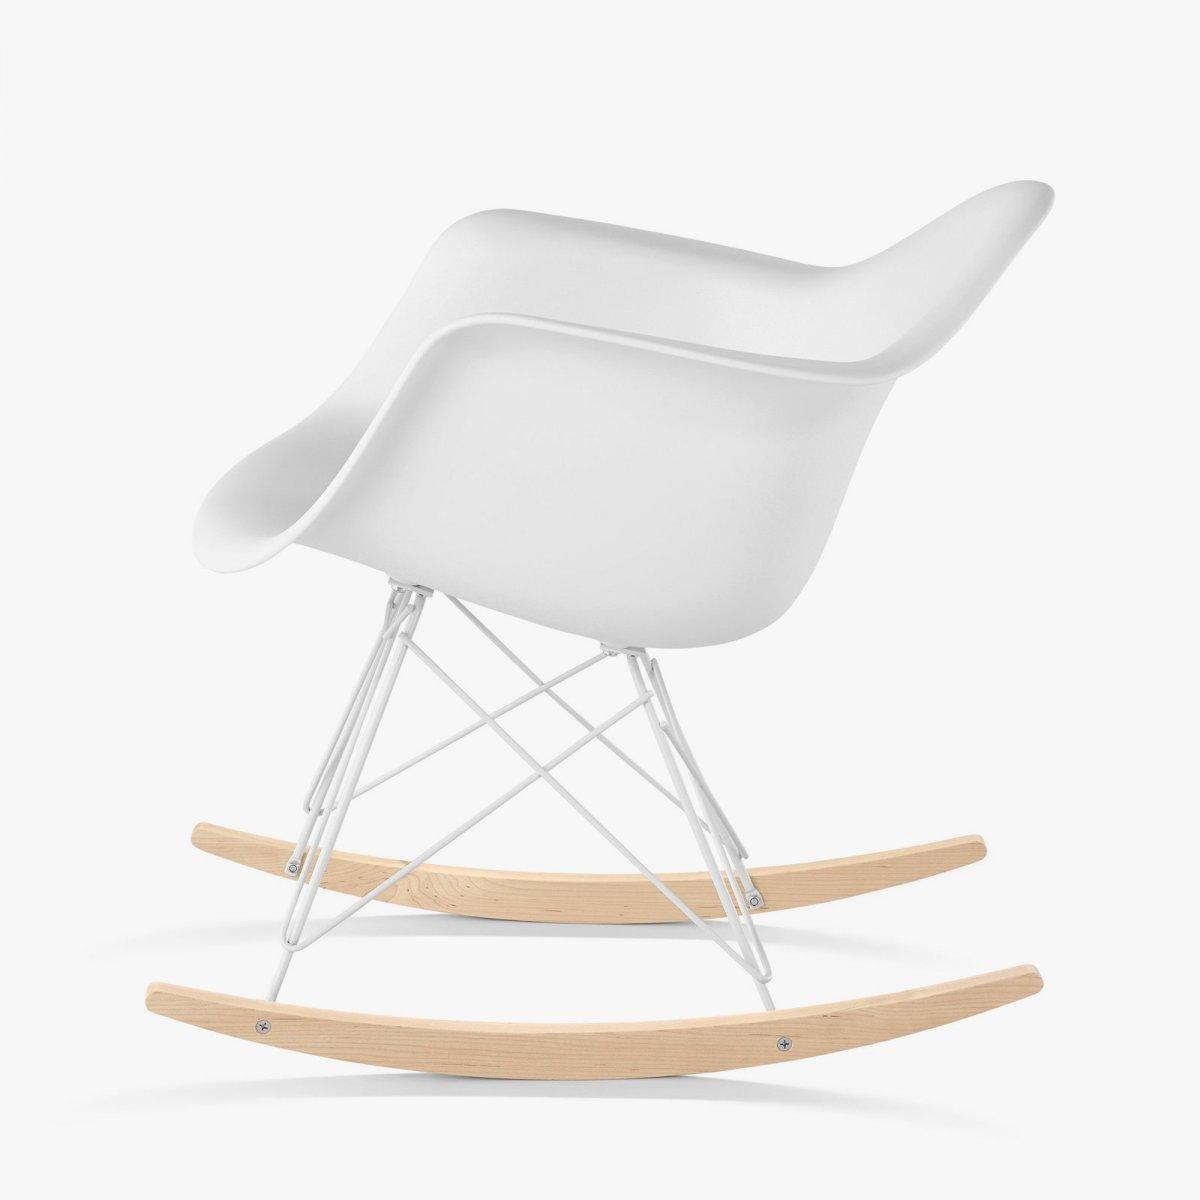 Eames Molded Plastic Armchair Rocker Base, white, side view.